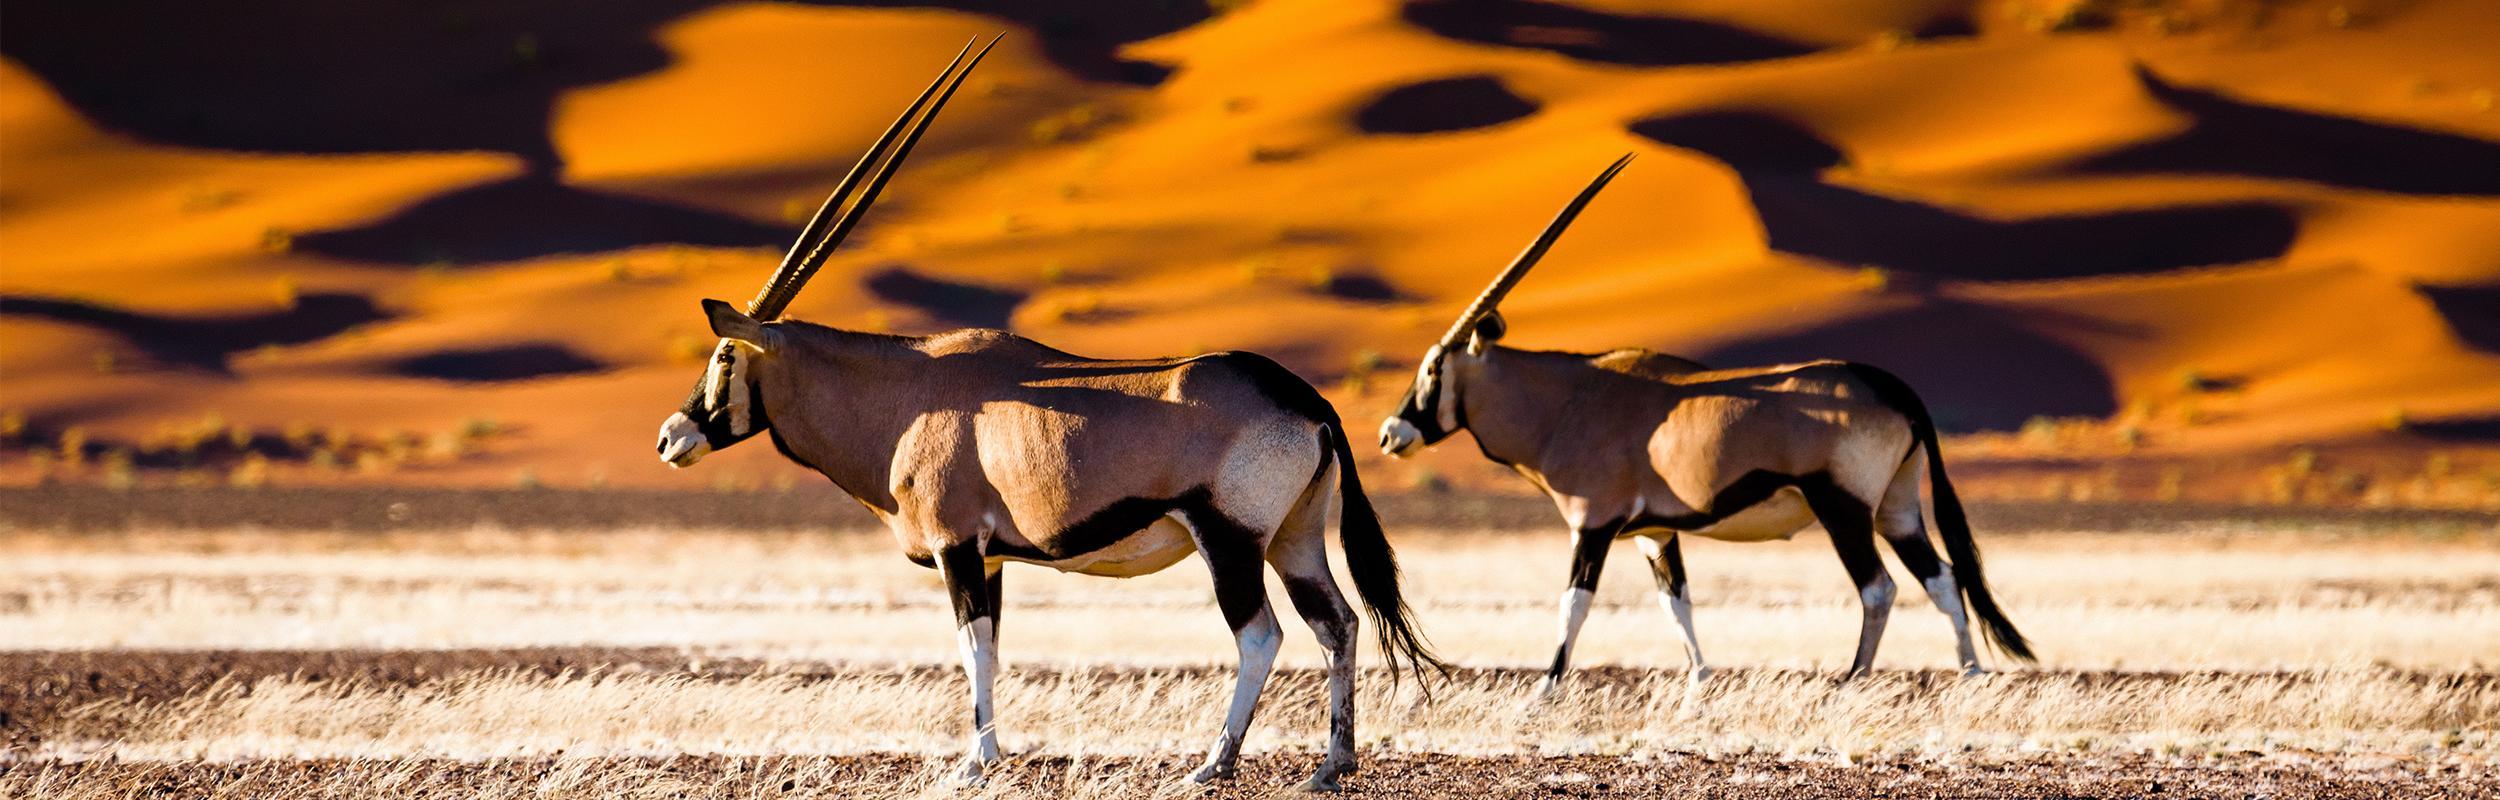 Hoogtepunten in Namibië